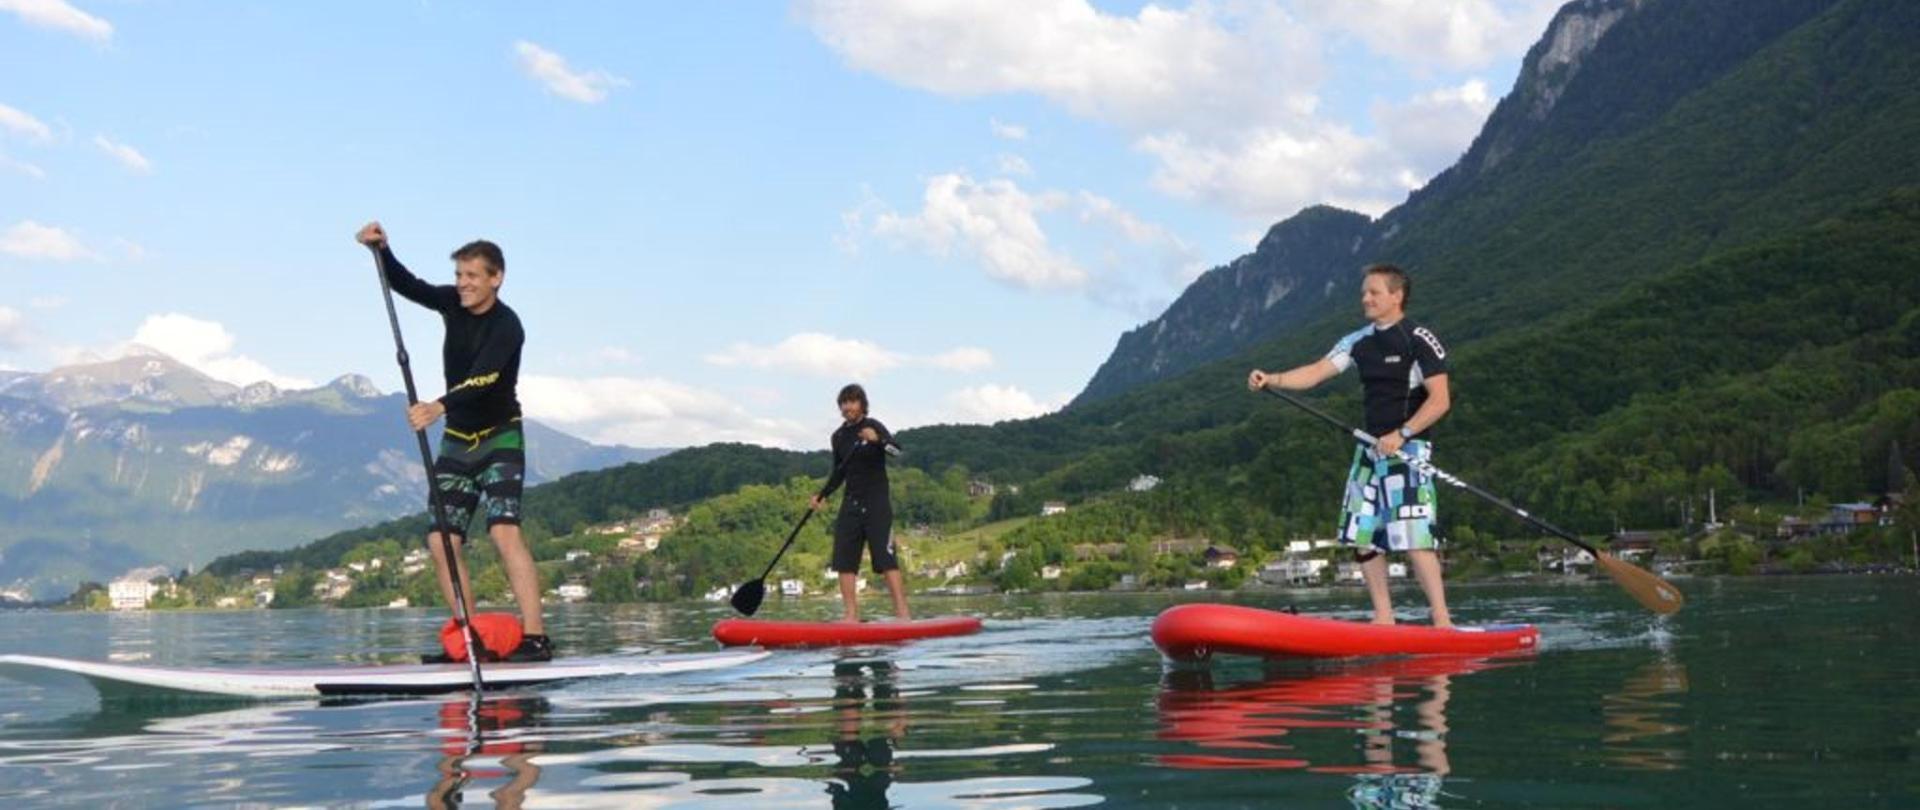 sup-paddle-1024x683.jpg